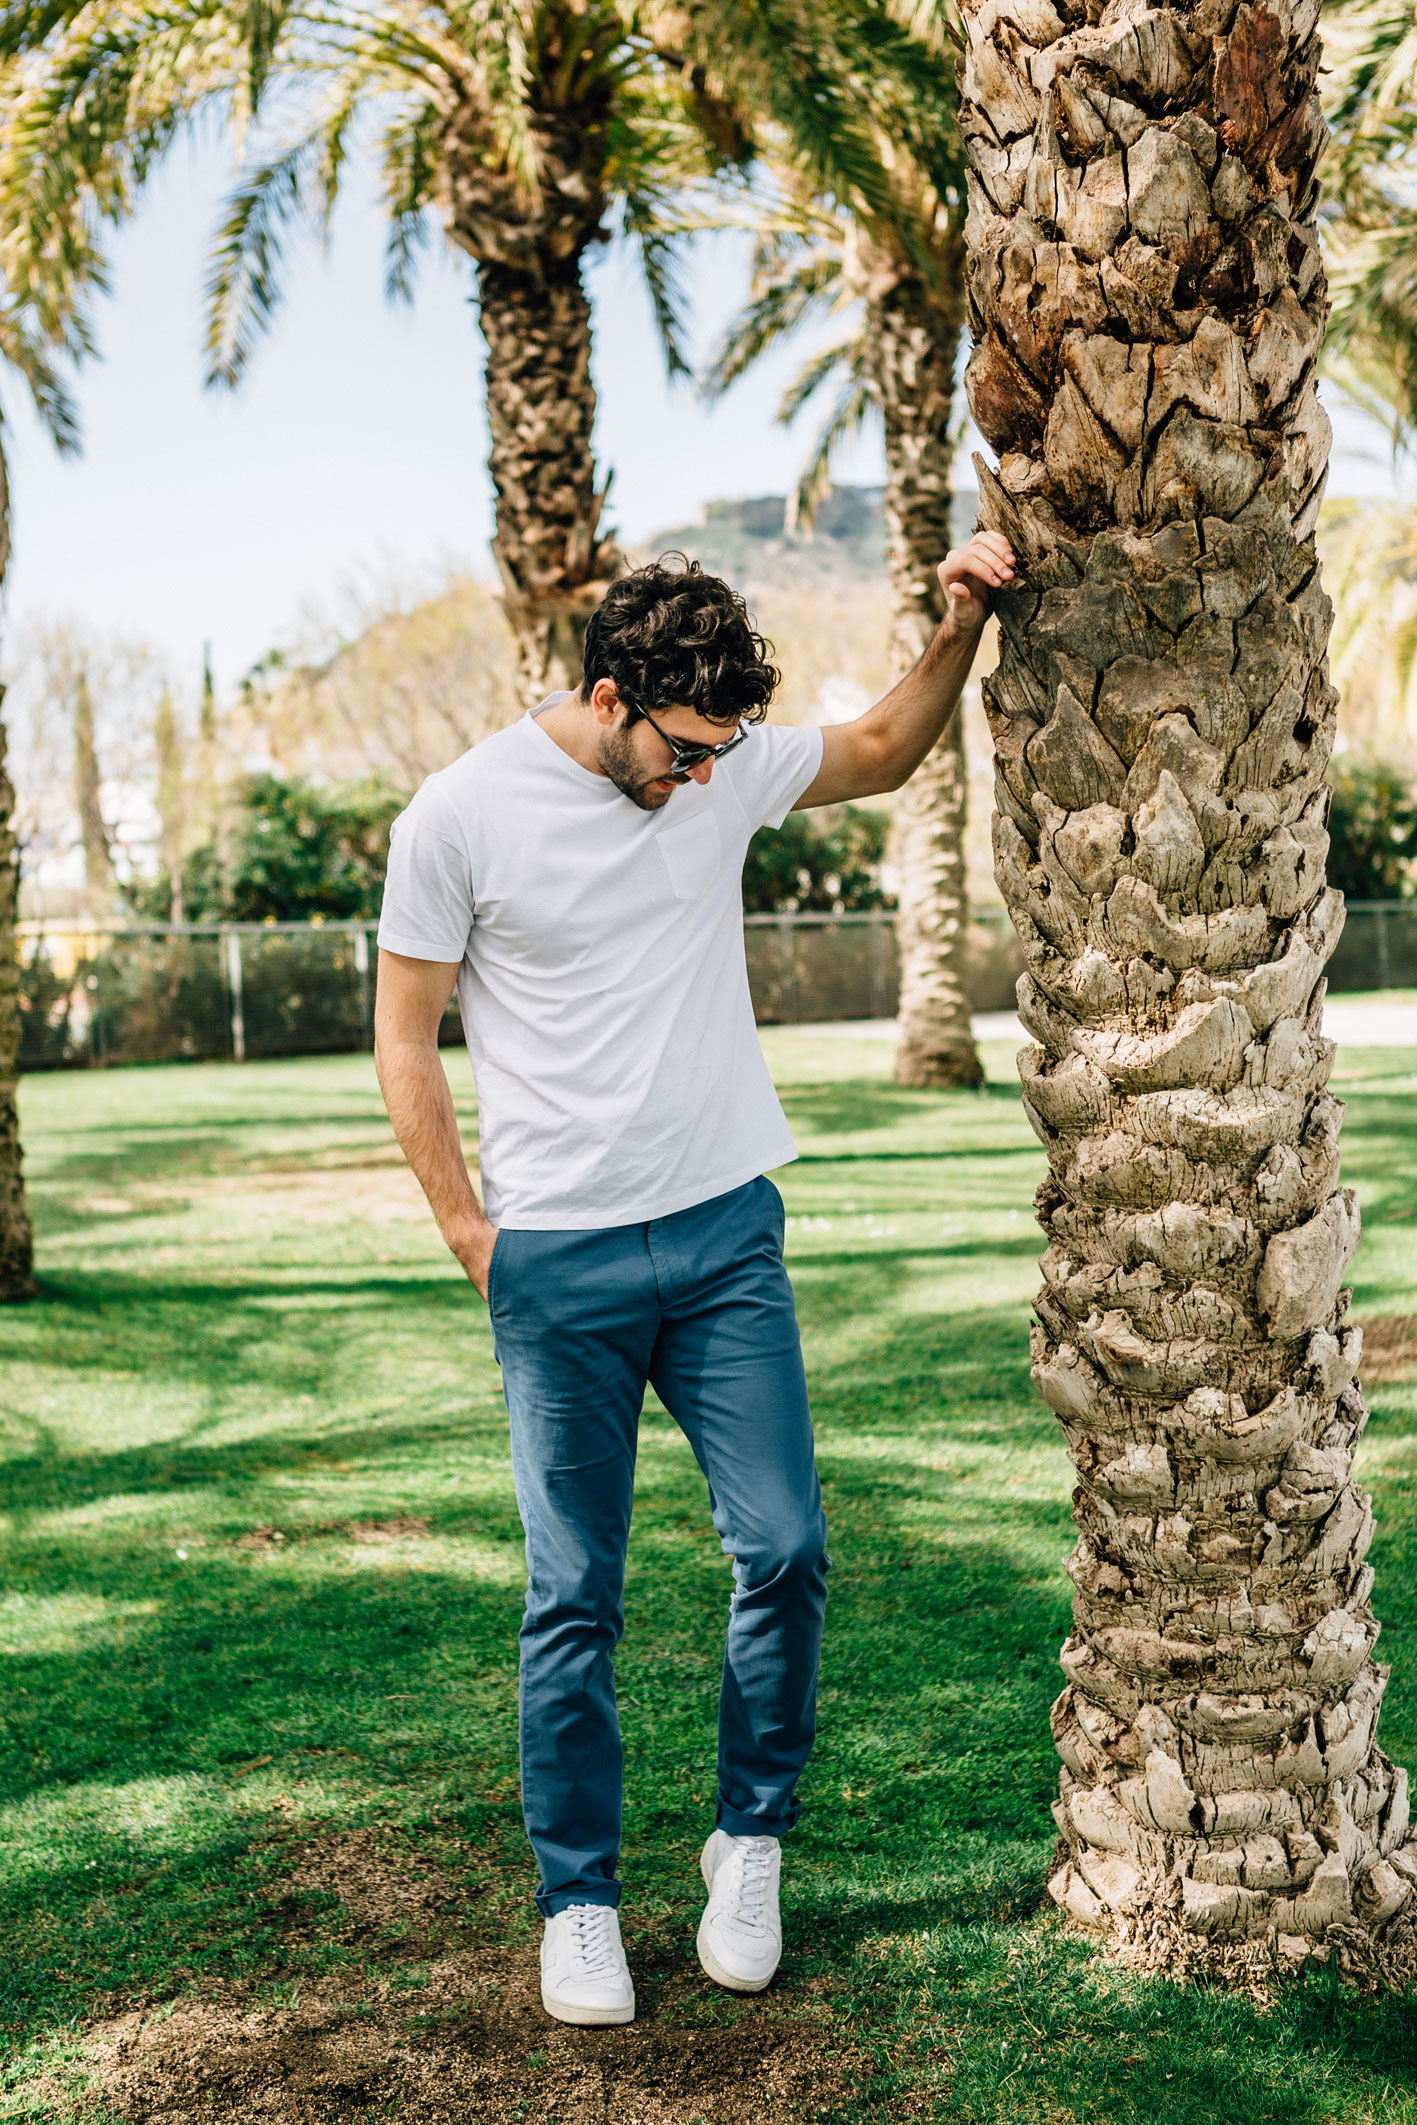 Chino bleu canard t-shirt blanc